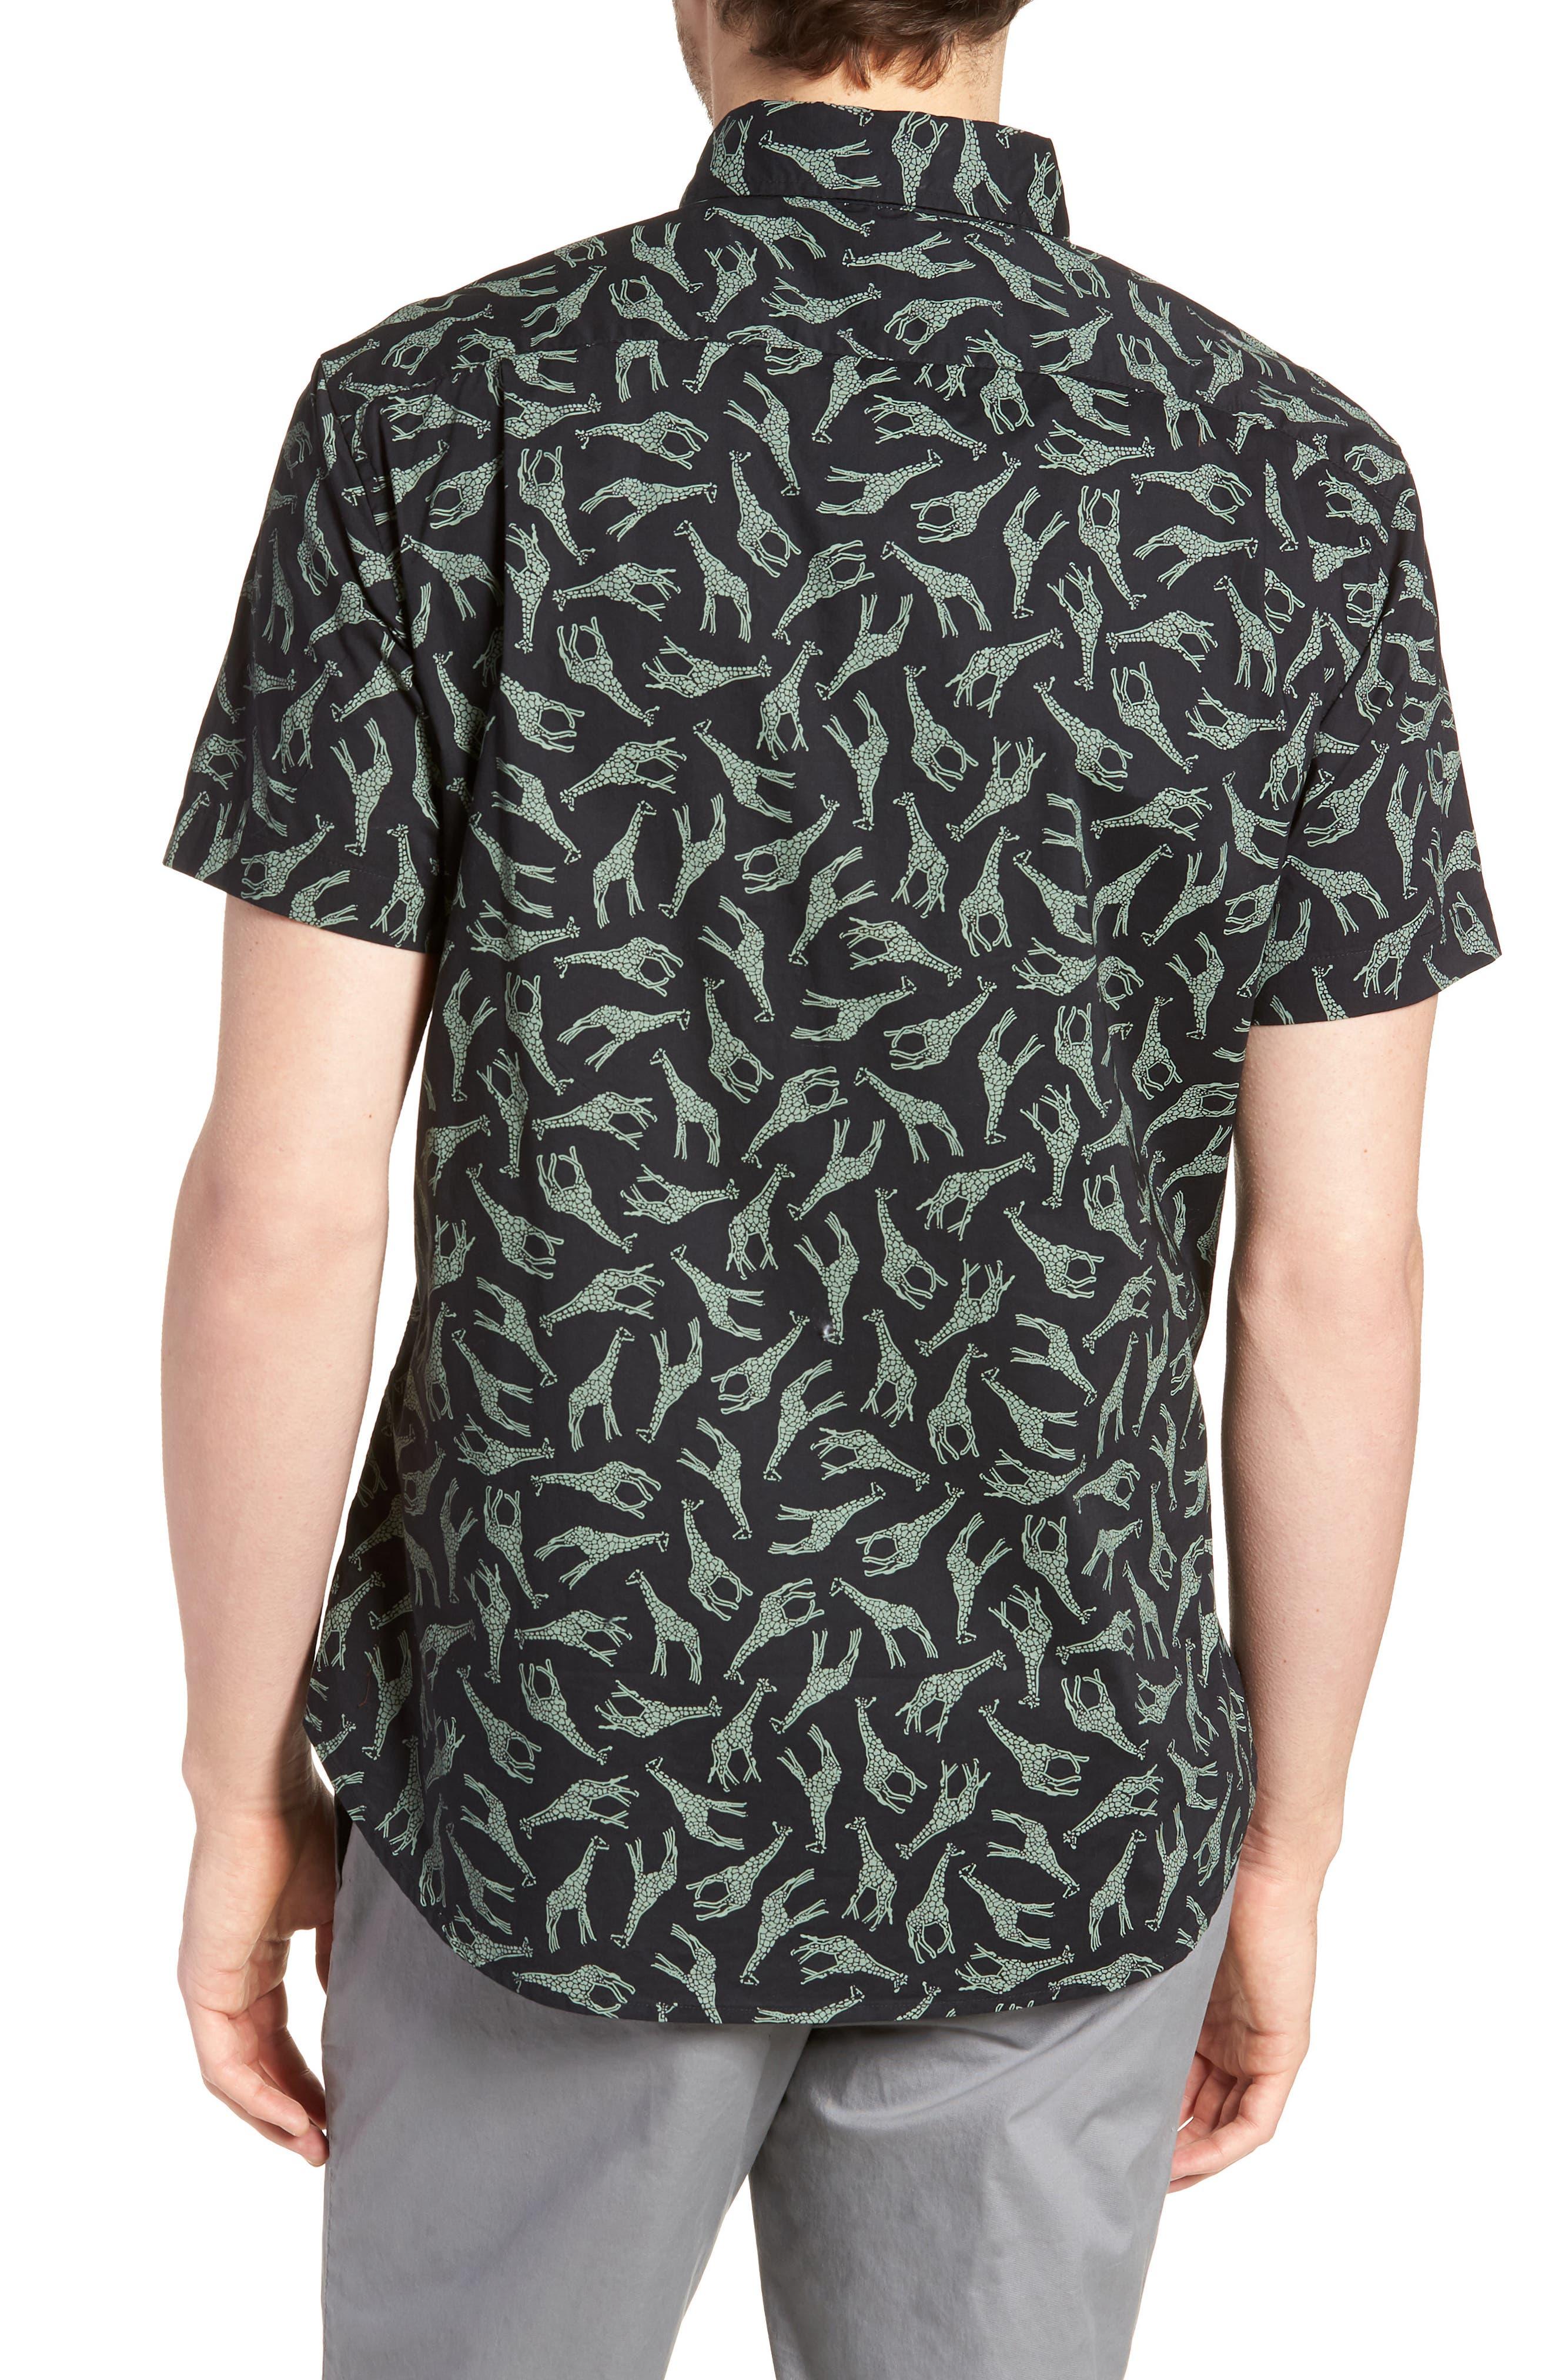 BONOBOS,                             Riviera Slim Fit Giraffe Print Sport Shirt,                             Alternate thumbnail 2, color,                             001